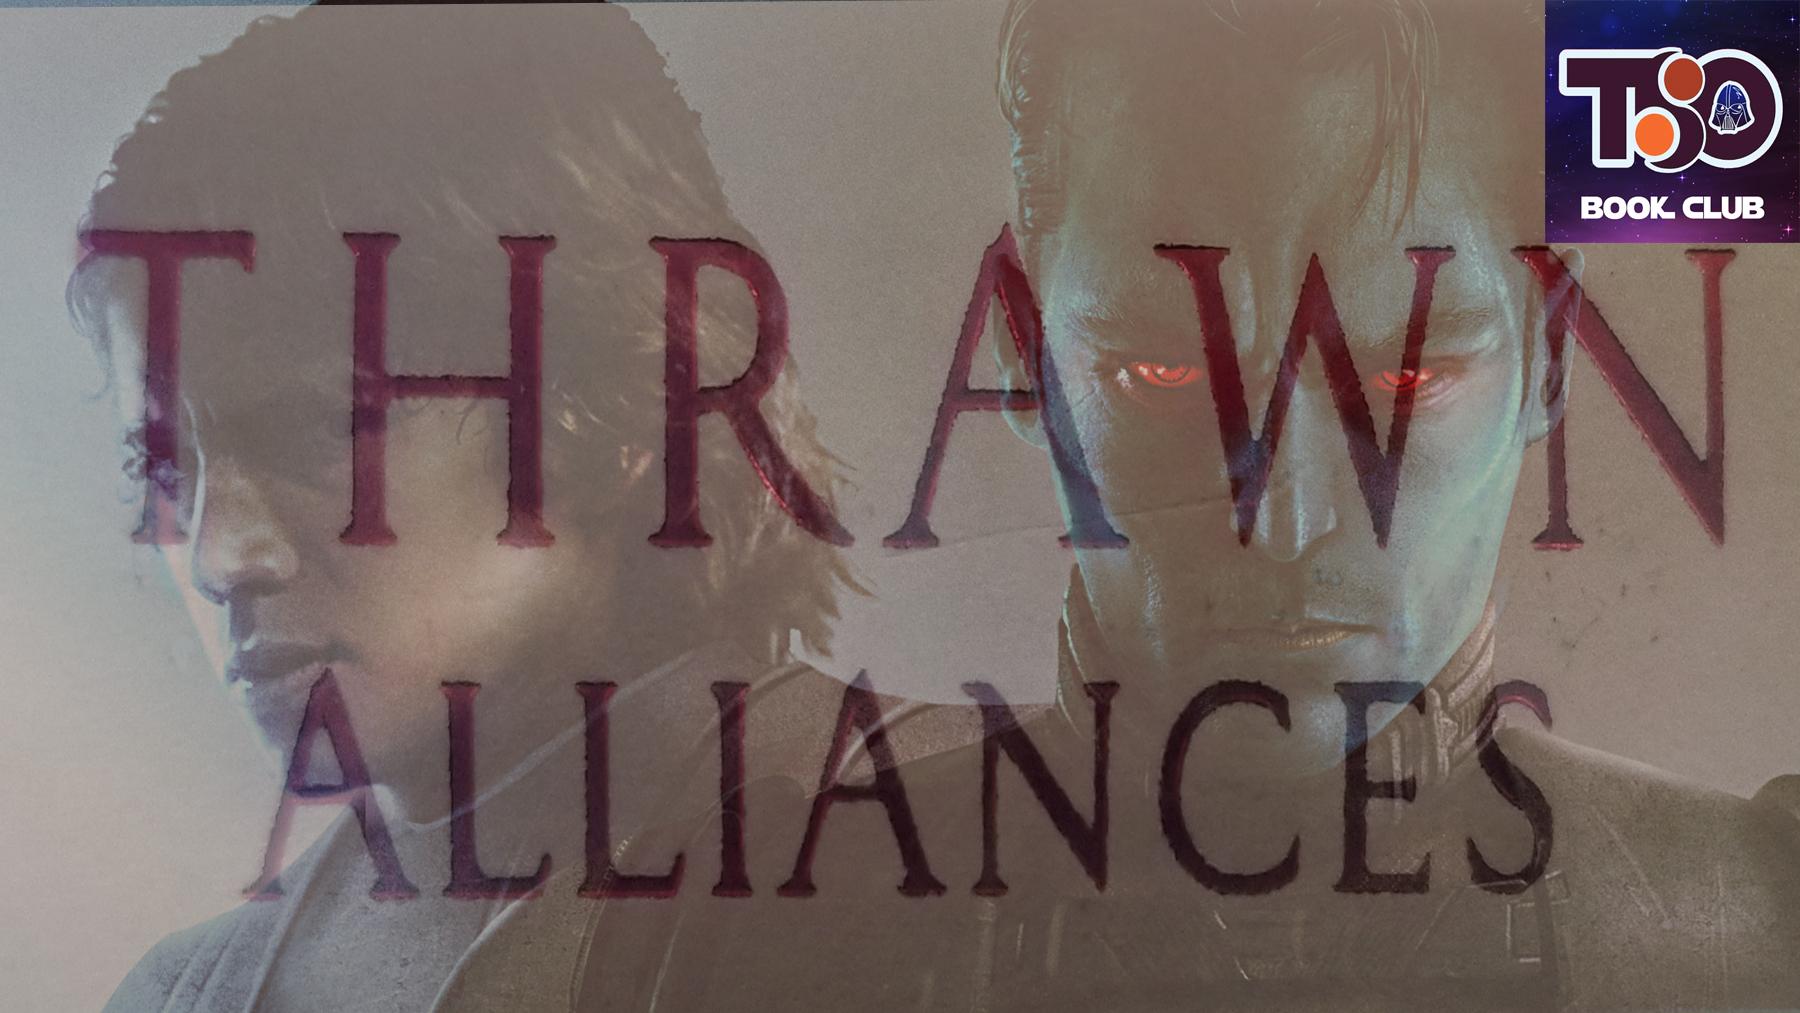 ThrawnAlliancesTSOBookclub.jpg